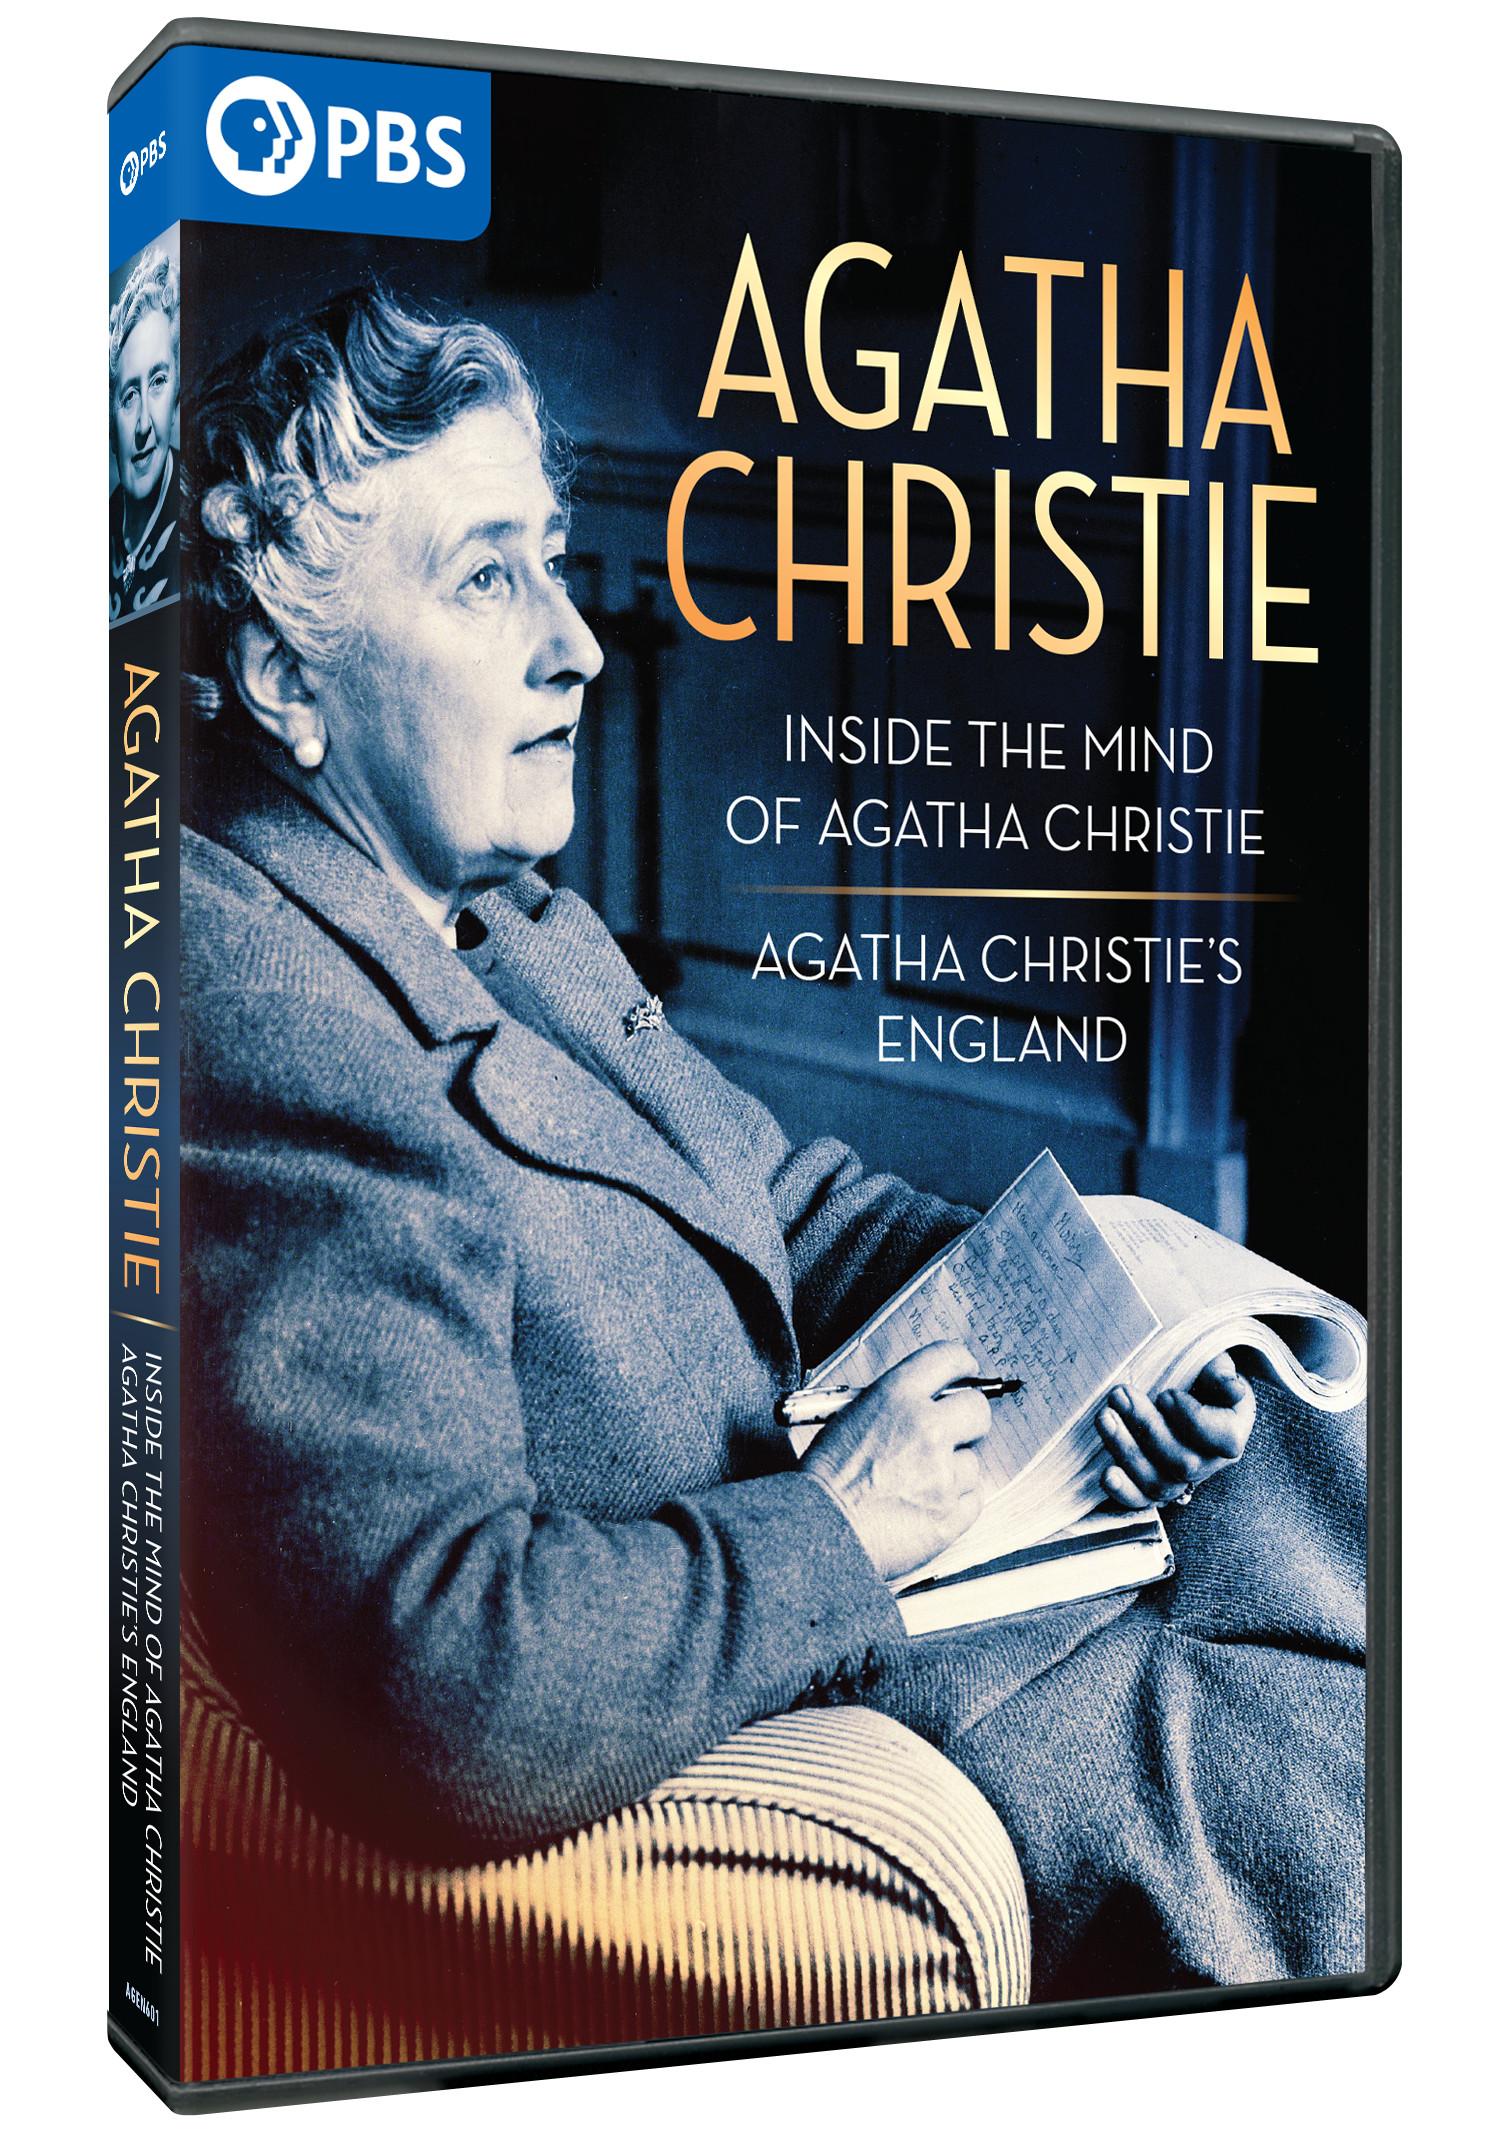 DVD: Agatha Christie: Inside the Mind of Agatha Christie and Agatha Christies England